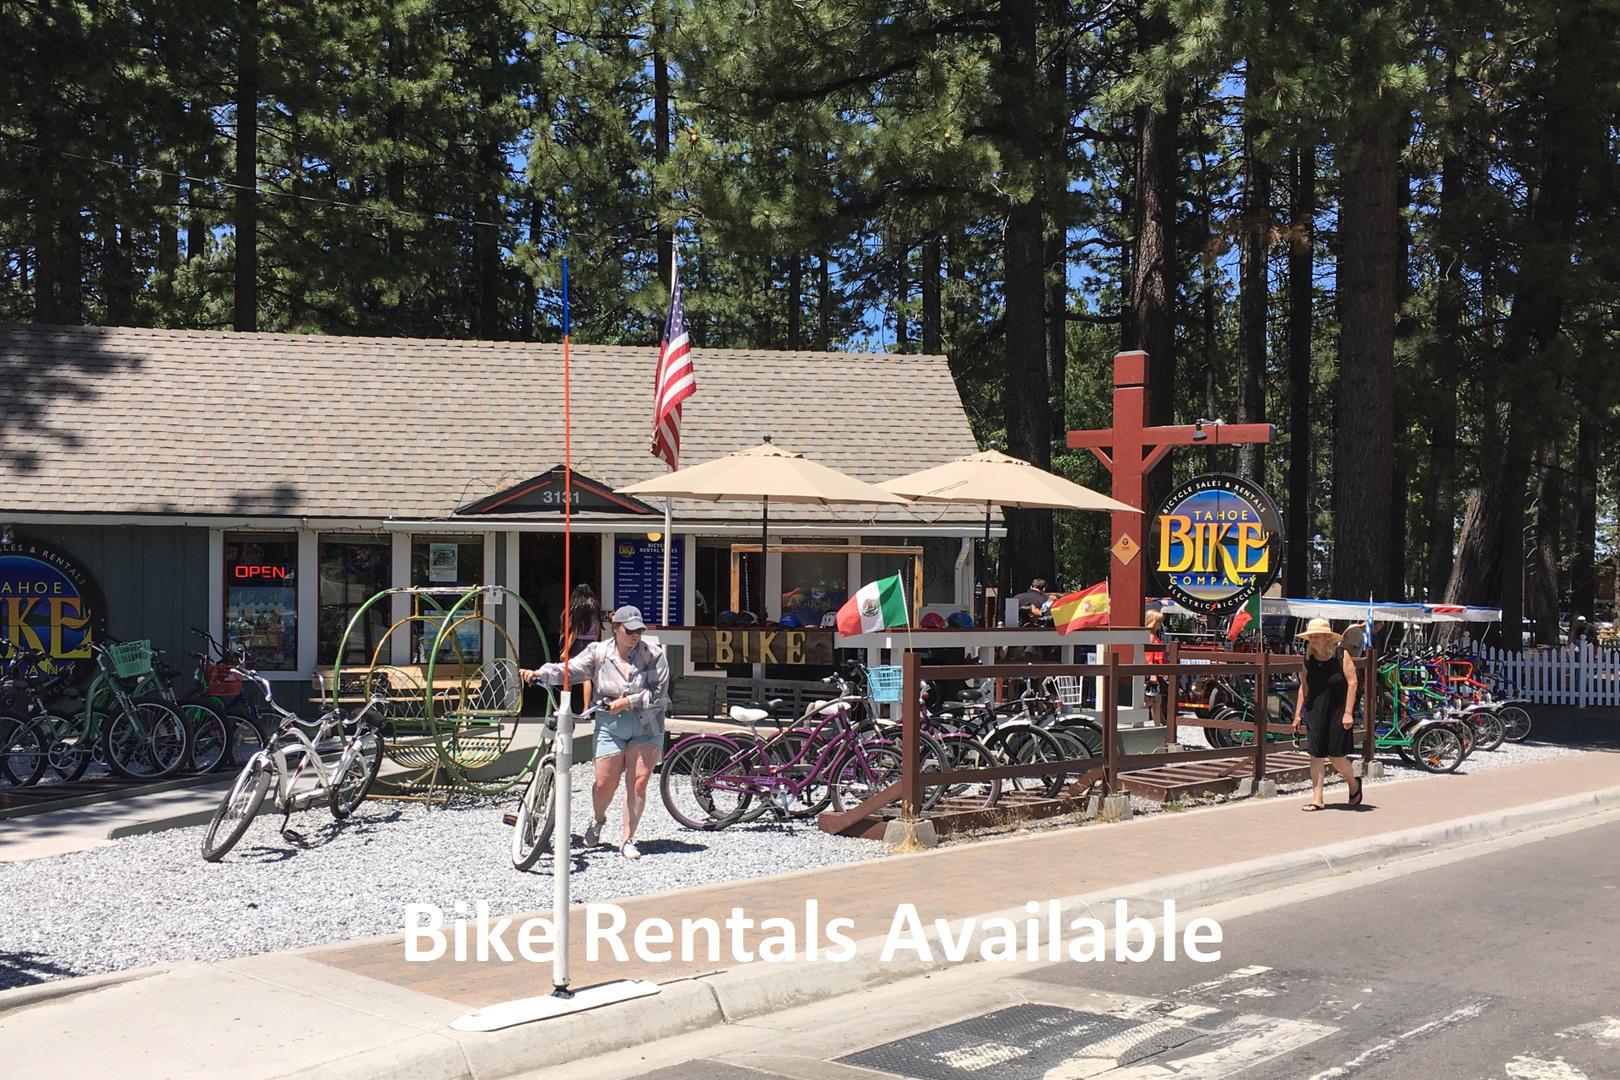 cyc0610 bike rentals